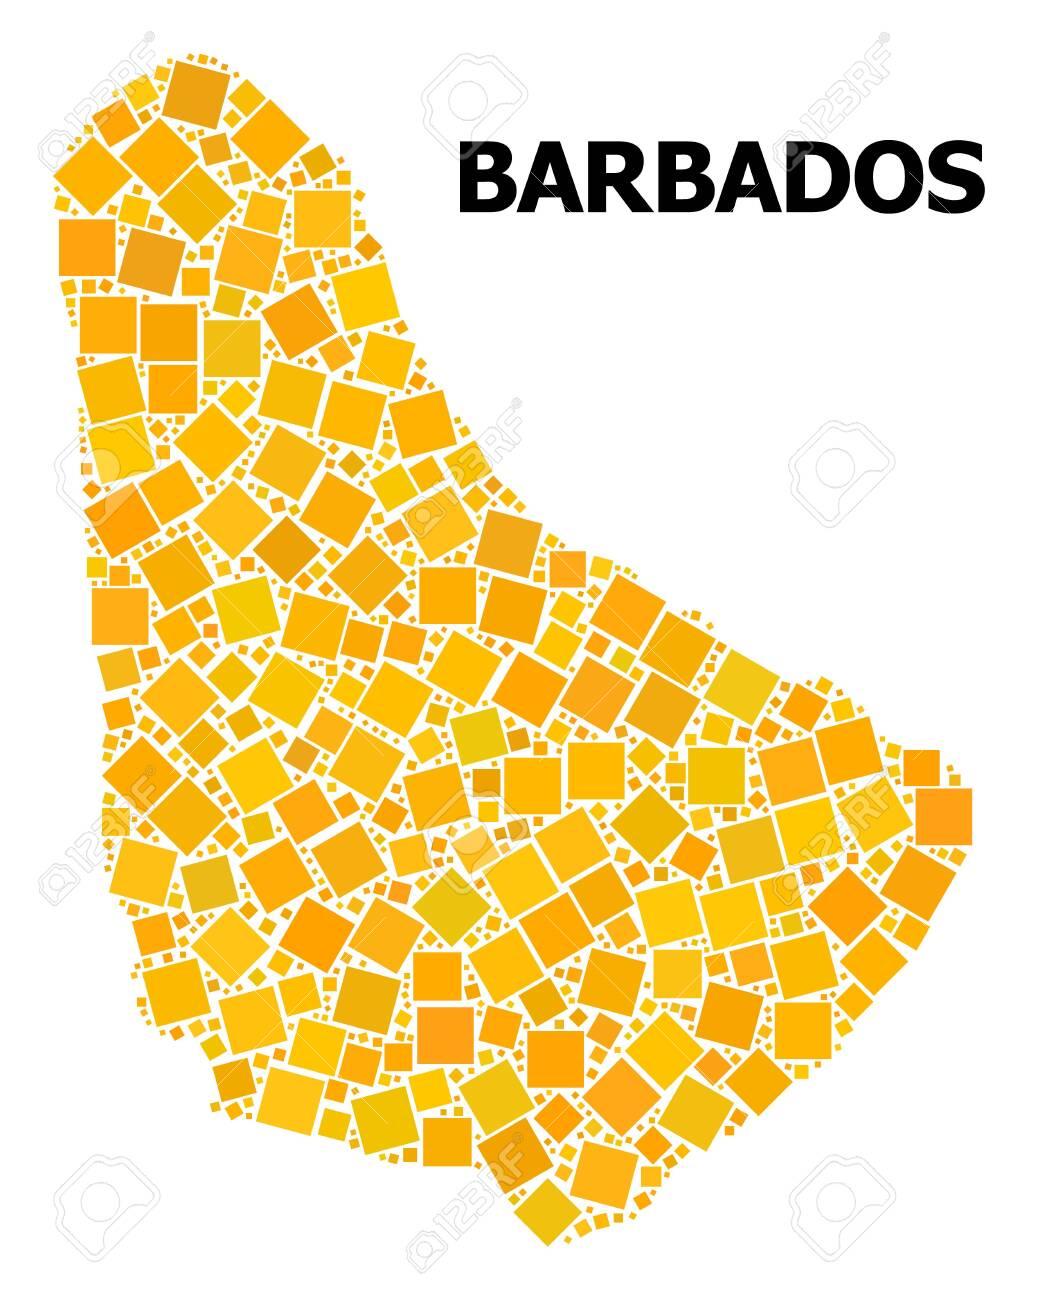 Gold square pattern vector map of Barbados. Abstract composition.. on flag of barbados, zimbabwe map, caribbean sea, grantley adams international airport, saint thomas, cayman islands map, barbados dollar, british virgin islands, bonaire island map, west indies map, americas map, greater antilles map, the bahamas, turks and caicos islands, bahamas map, caribbean map, barbadian people, carribean map, jamaica map, virgin islands map, cuba map, trinidad and tobago, tanzania map, puerto rico map, windward islands, haiti map, antigua and barbuda, belize map, aruba map, united states map, saint vincent, maldives island map, world map, saint vincent and the grenadines,